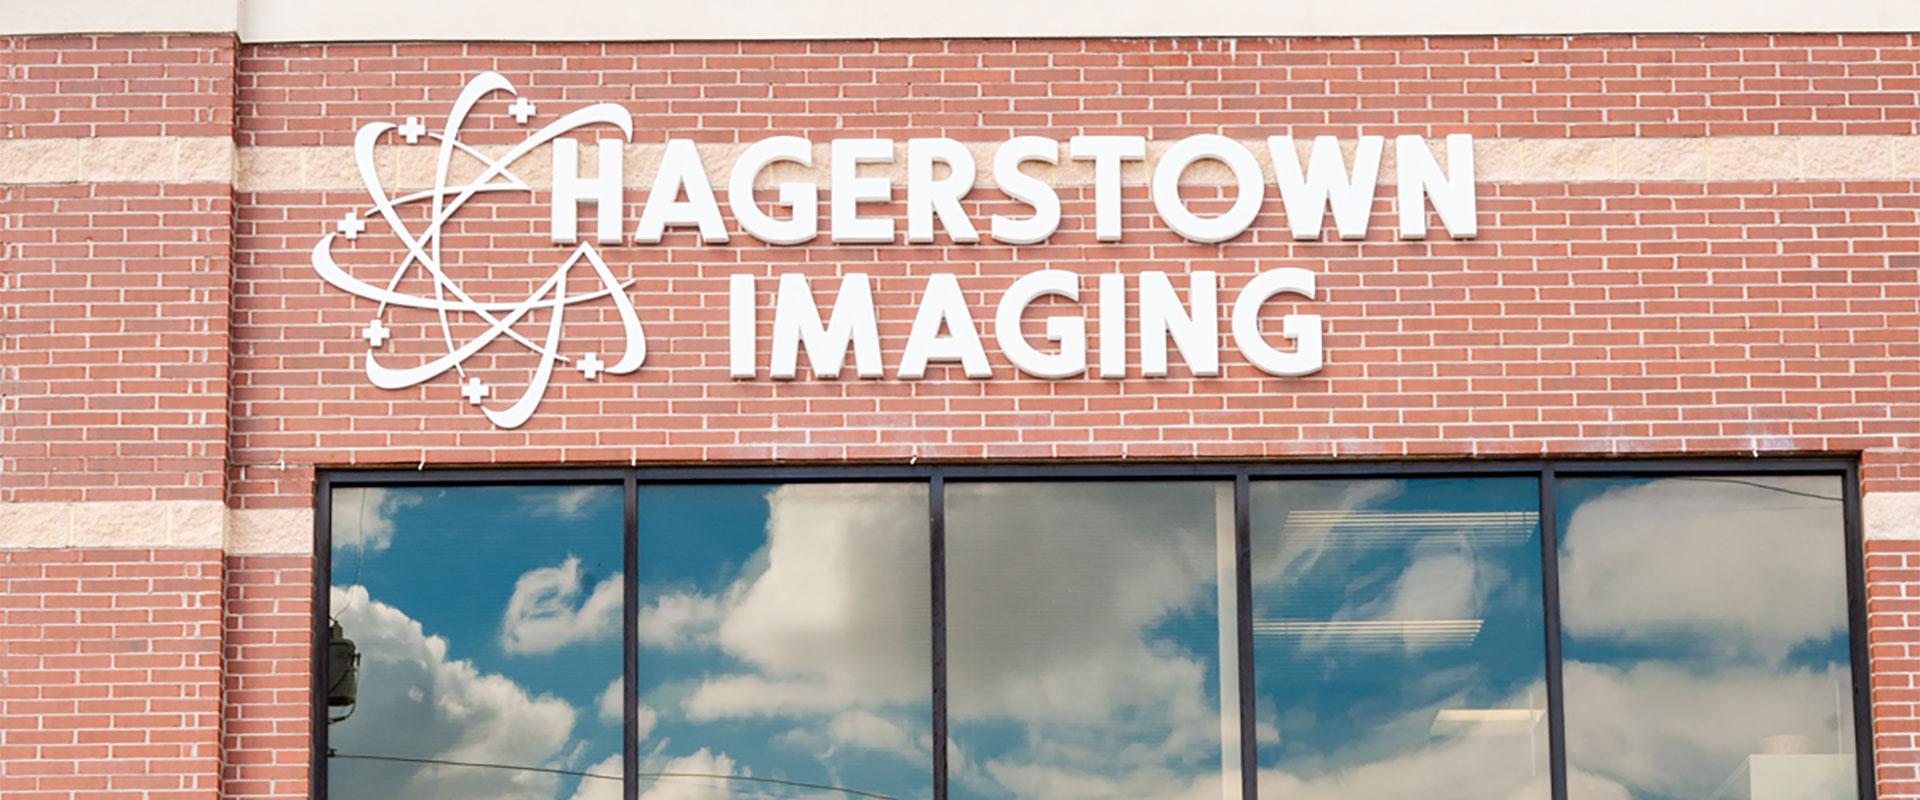 Hagerstown Imaging